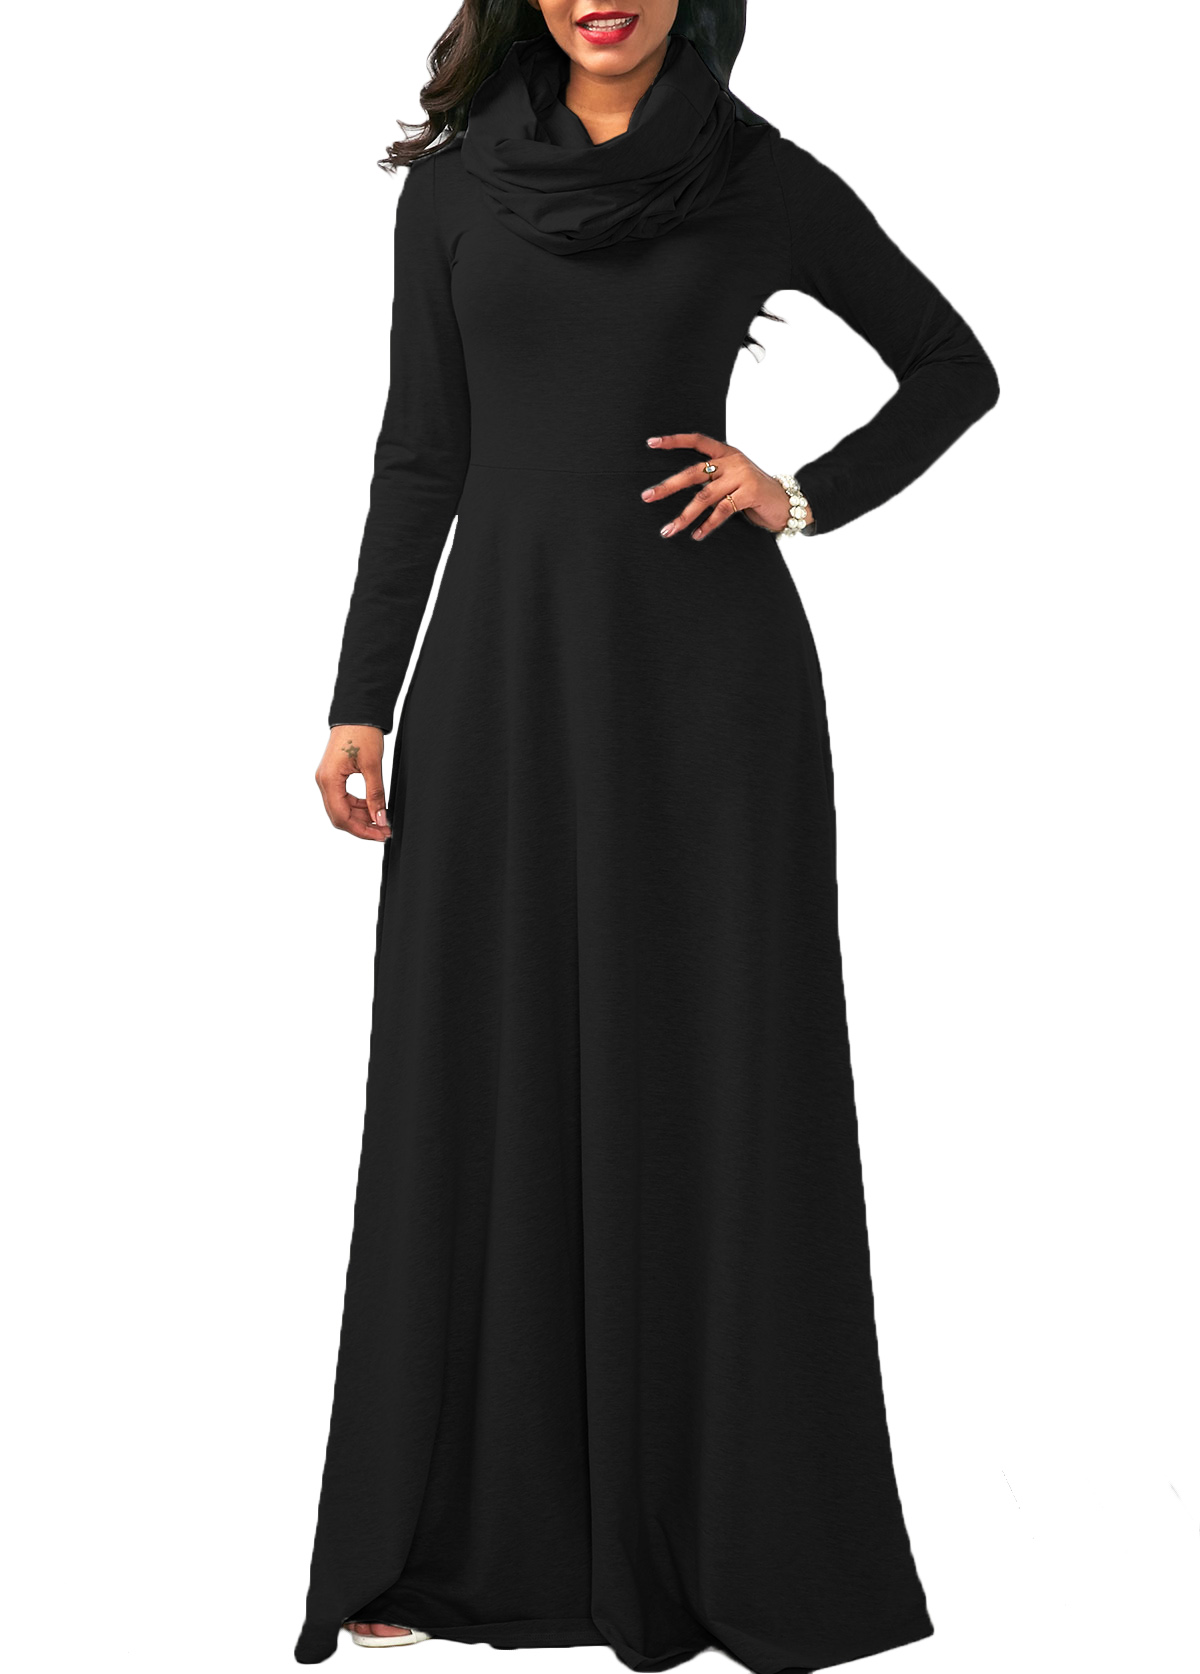 Cow Neck Long Sleeve Maxi Dress